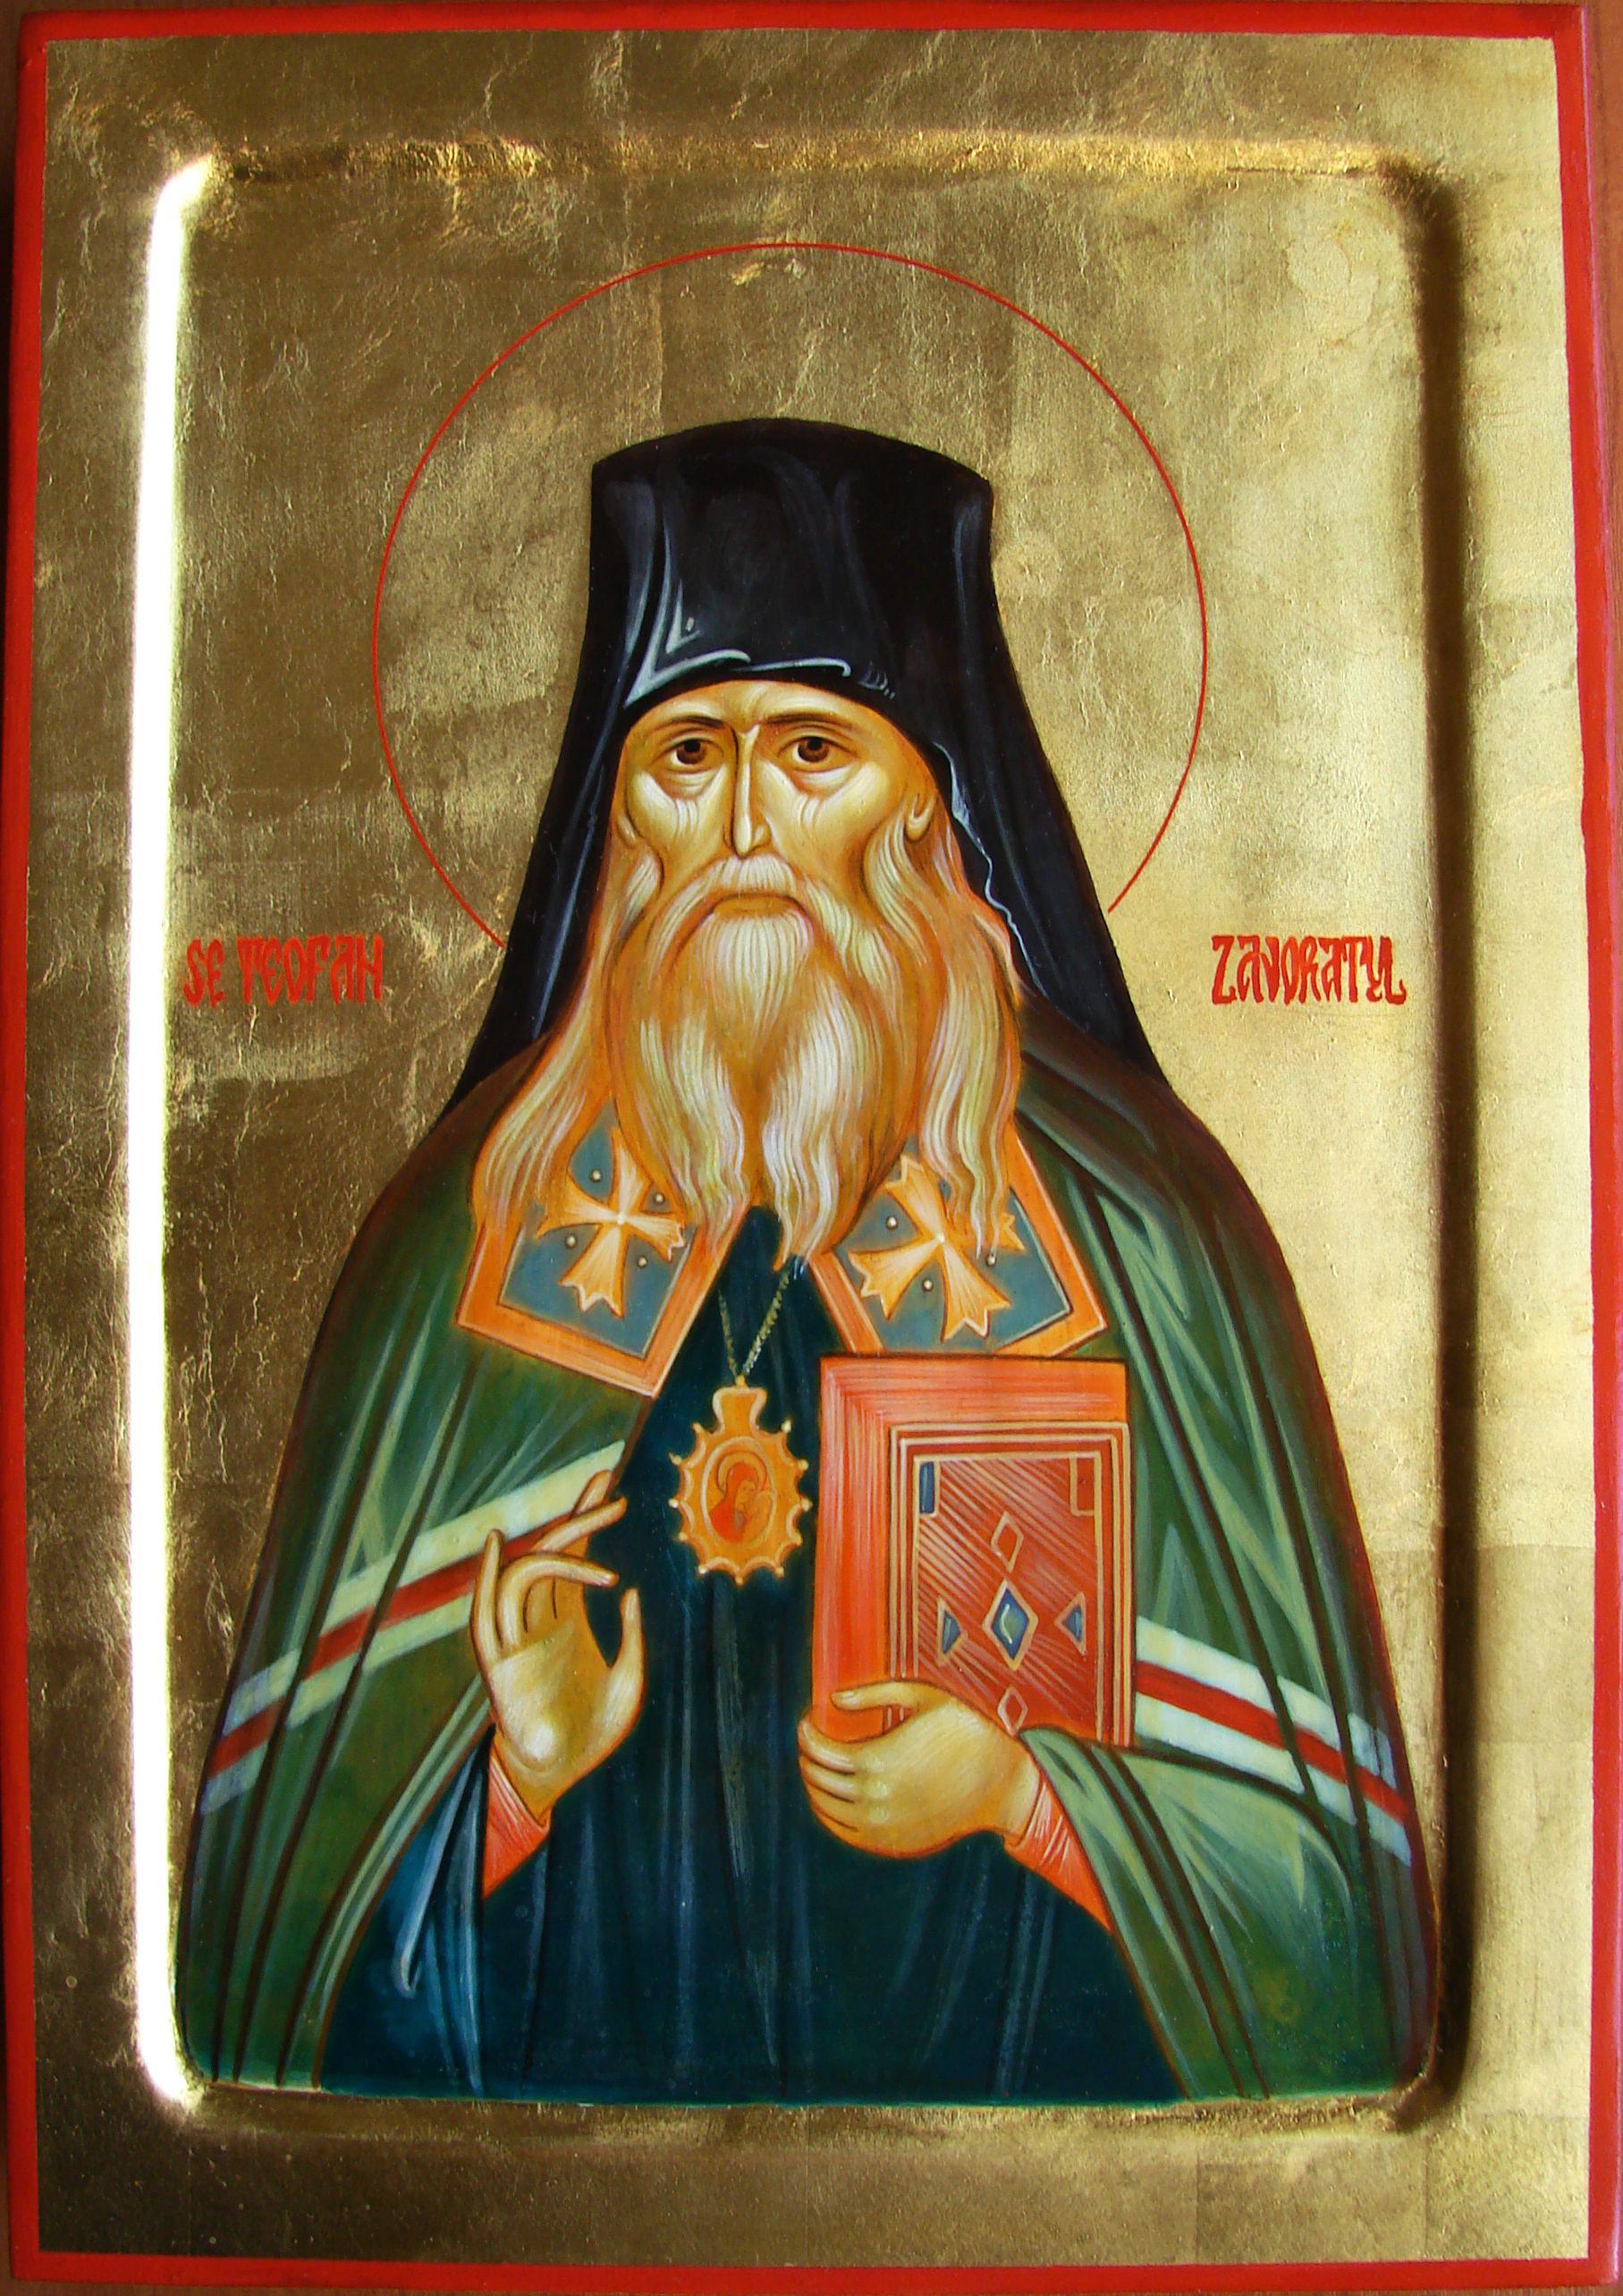 Episcopul Teofan Zavoratul